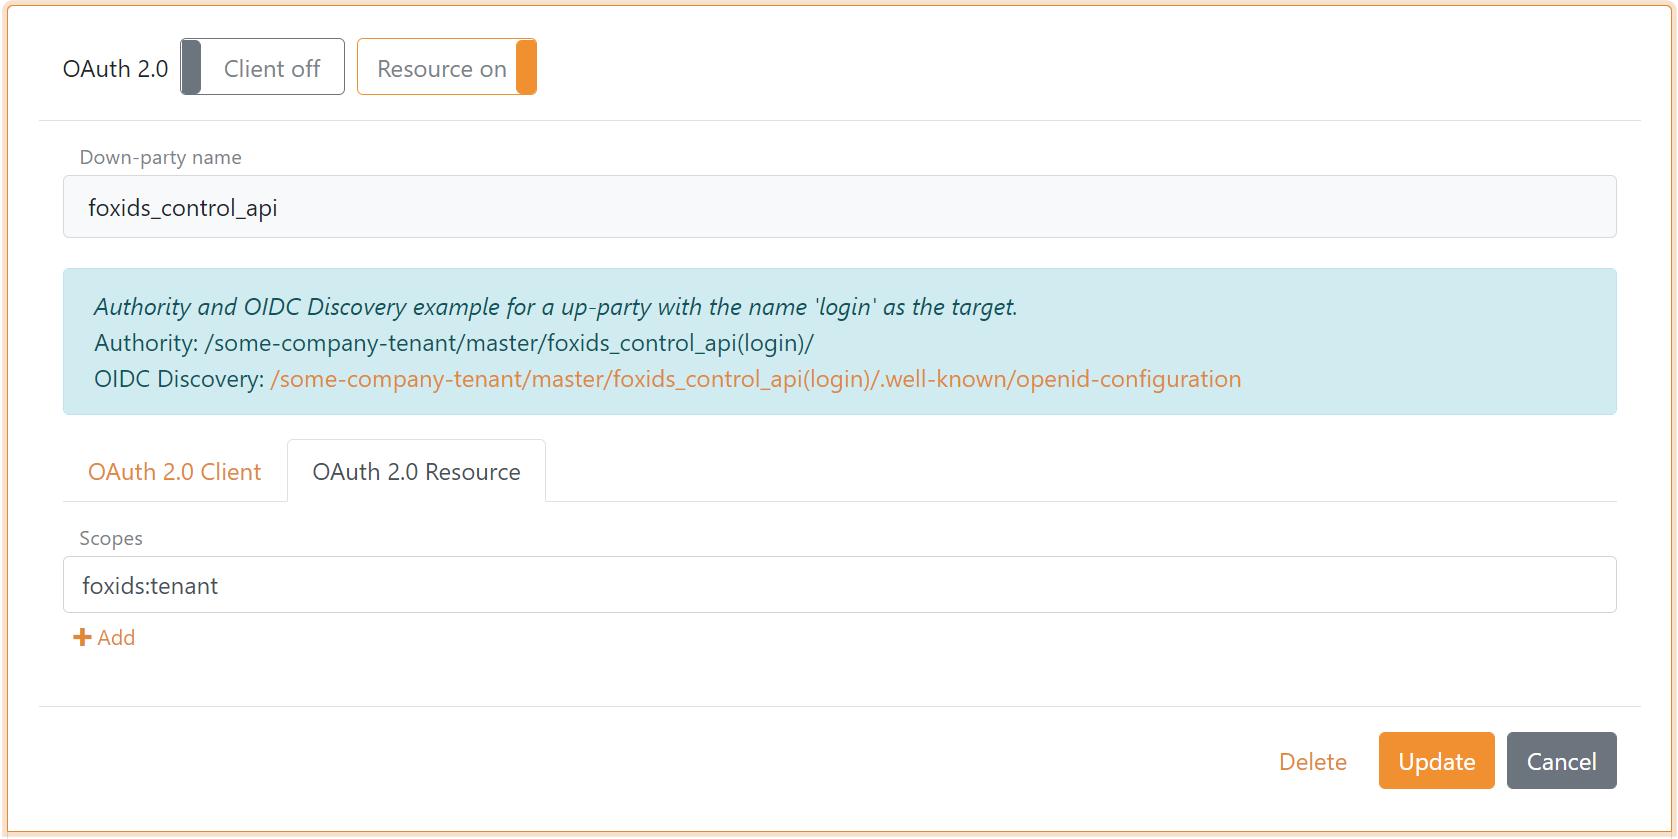 Configure foxids_control_api